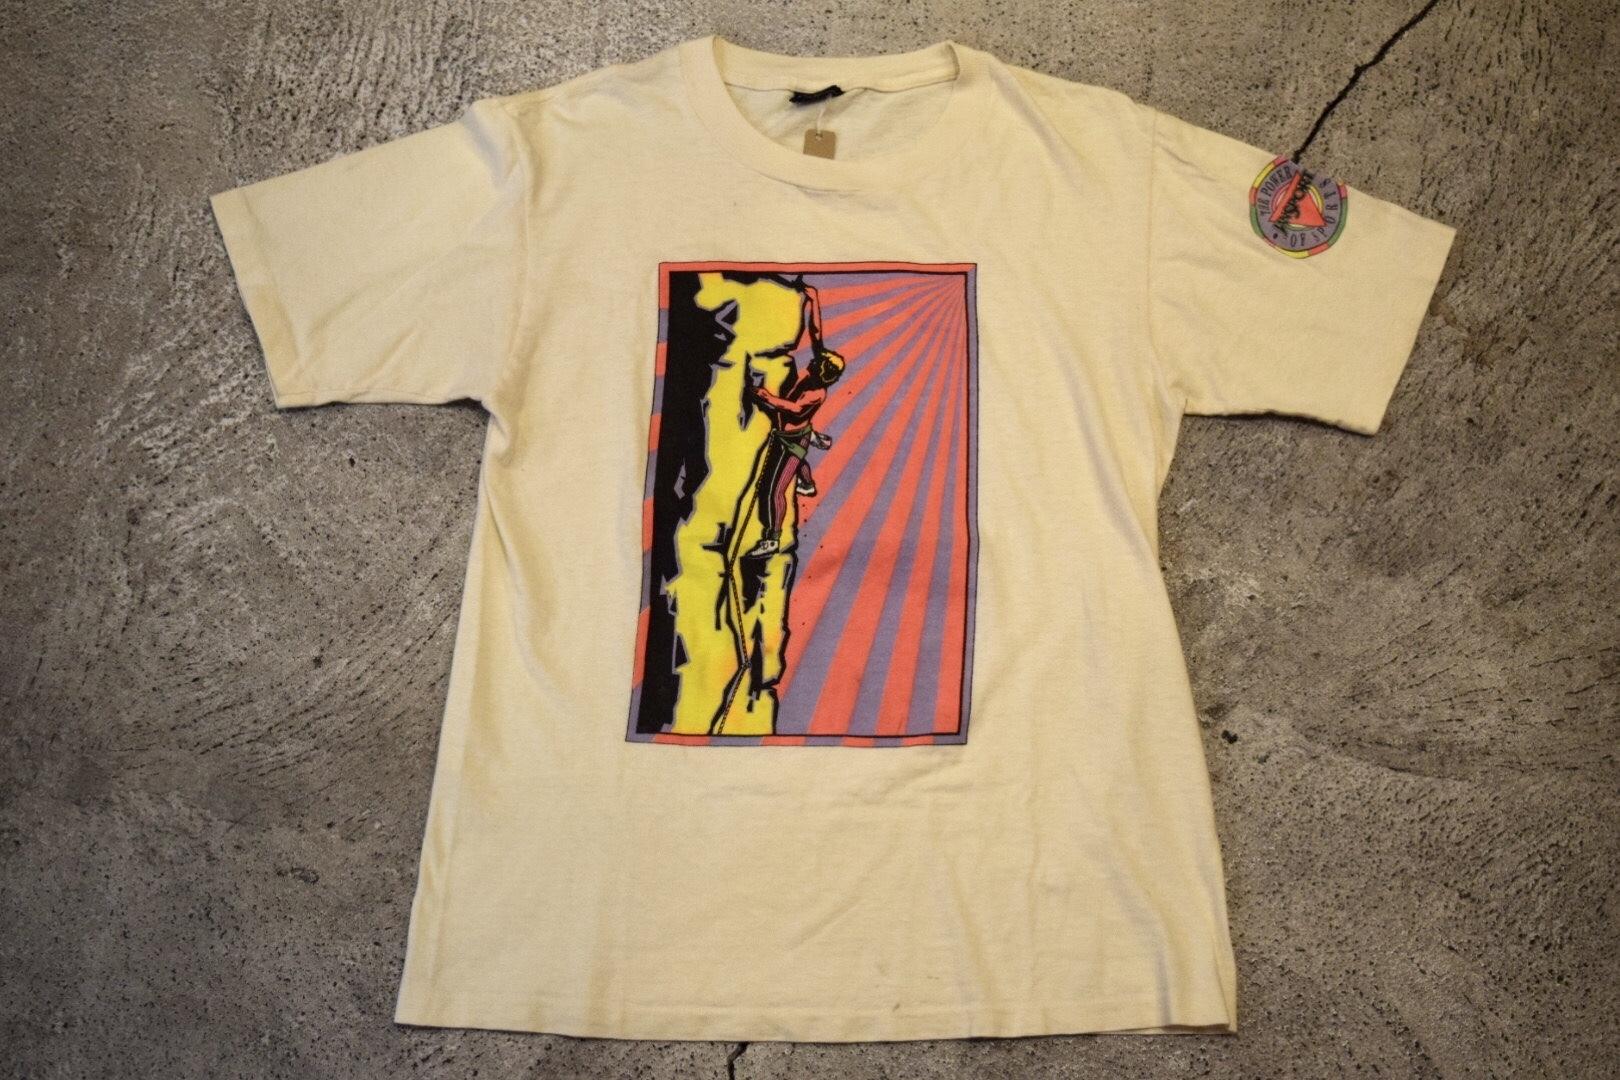 USED 80s JANSPORT T-shirt -Medium T0244